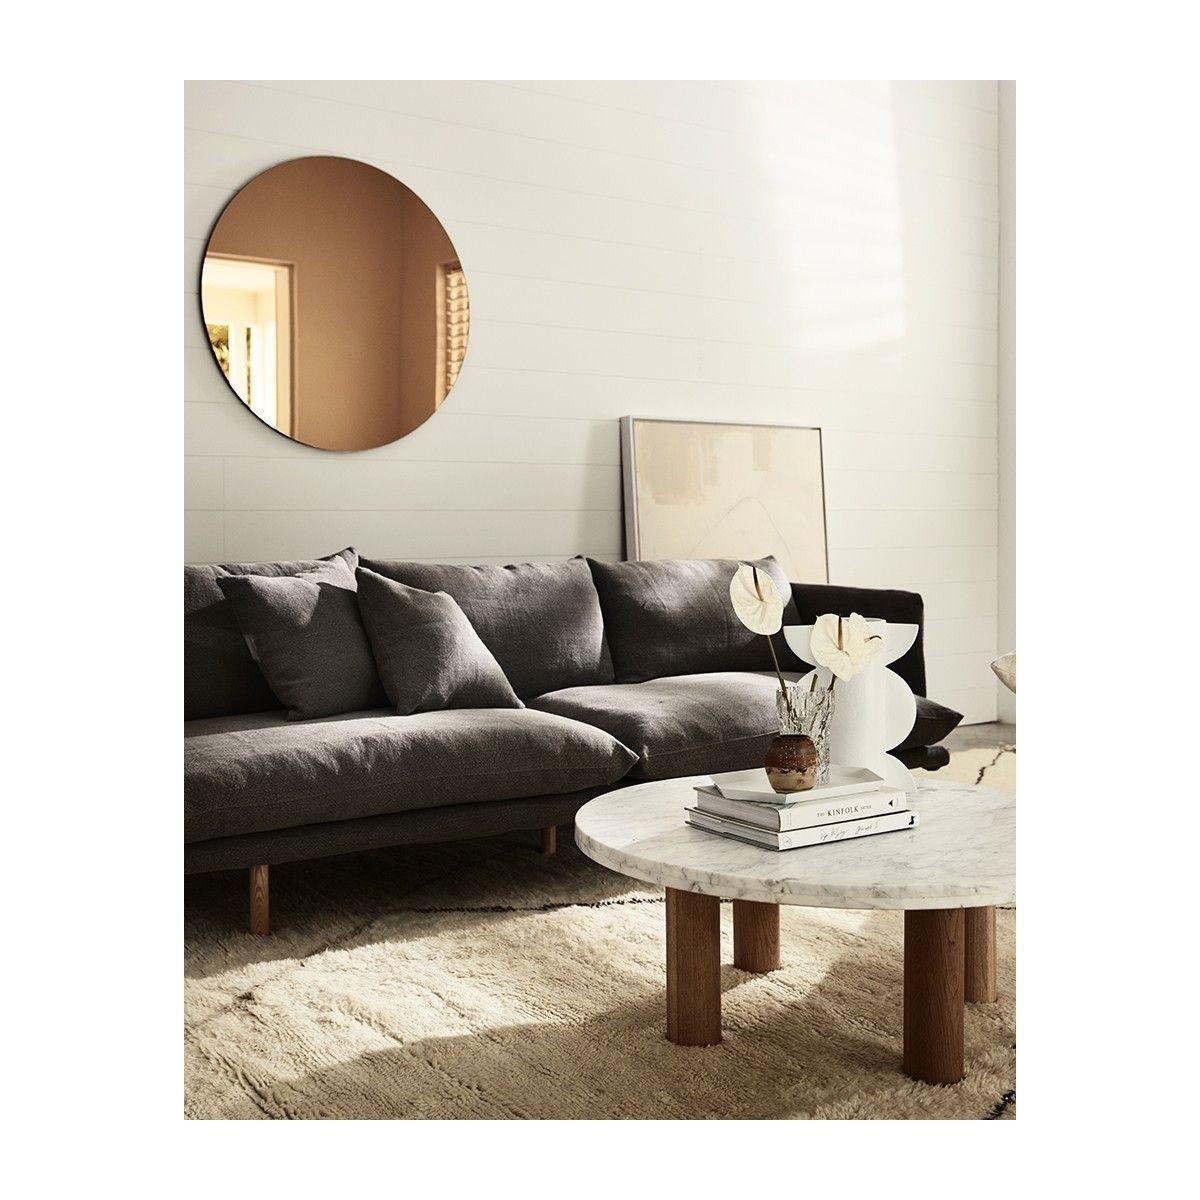 Best Sarah Ellison Chub Coffee Table Modern Furniture Buy 400 x 300